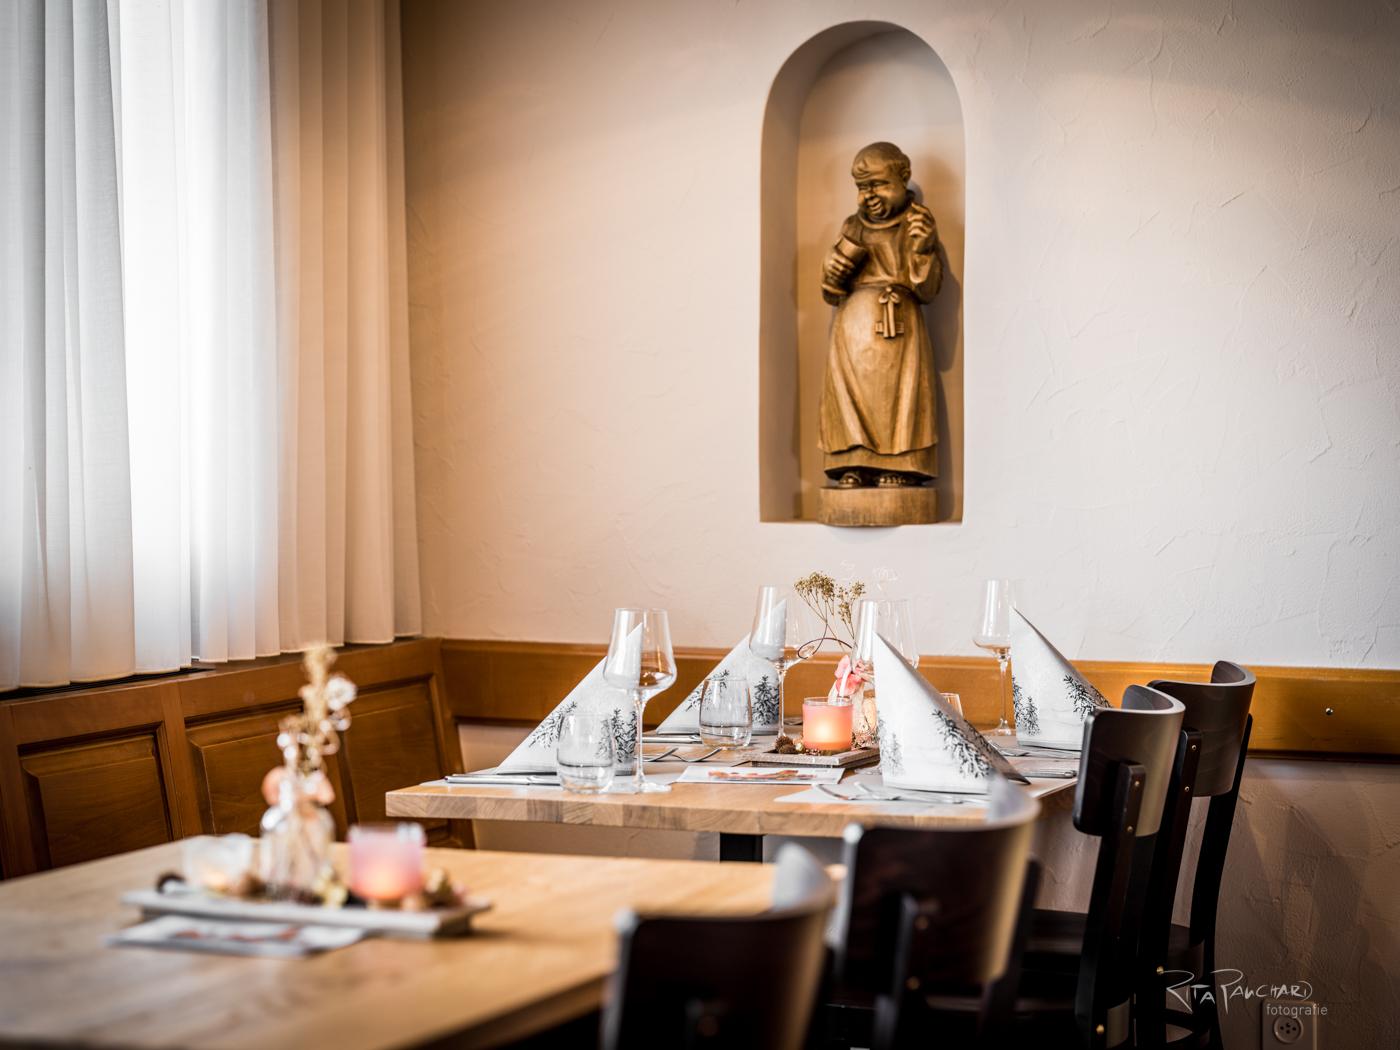 restaurantfotografie_gastrofotografie-5086.jpg